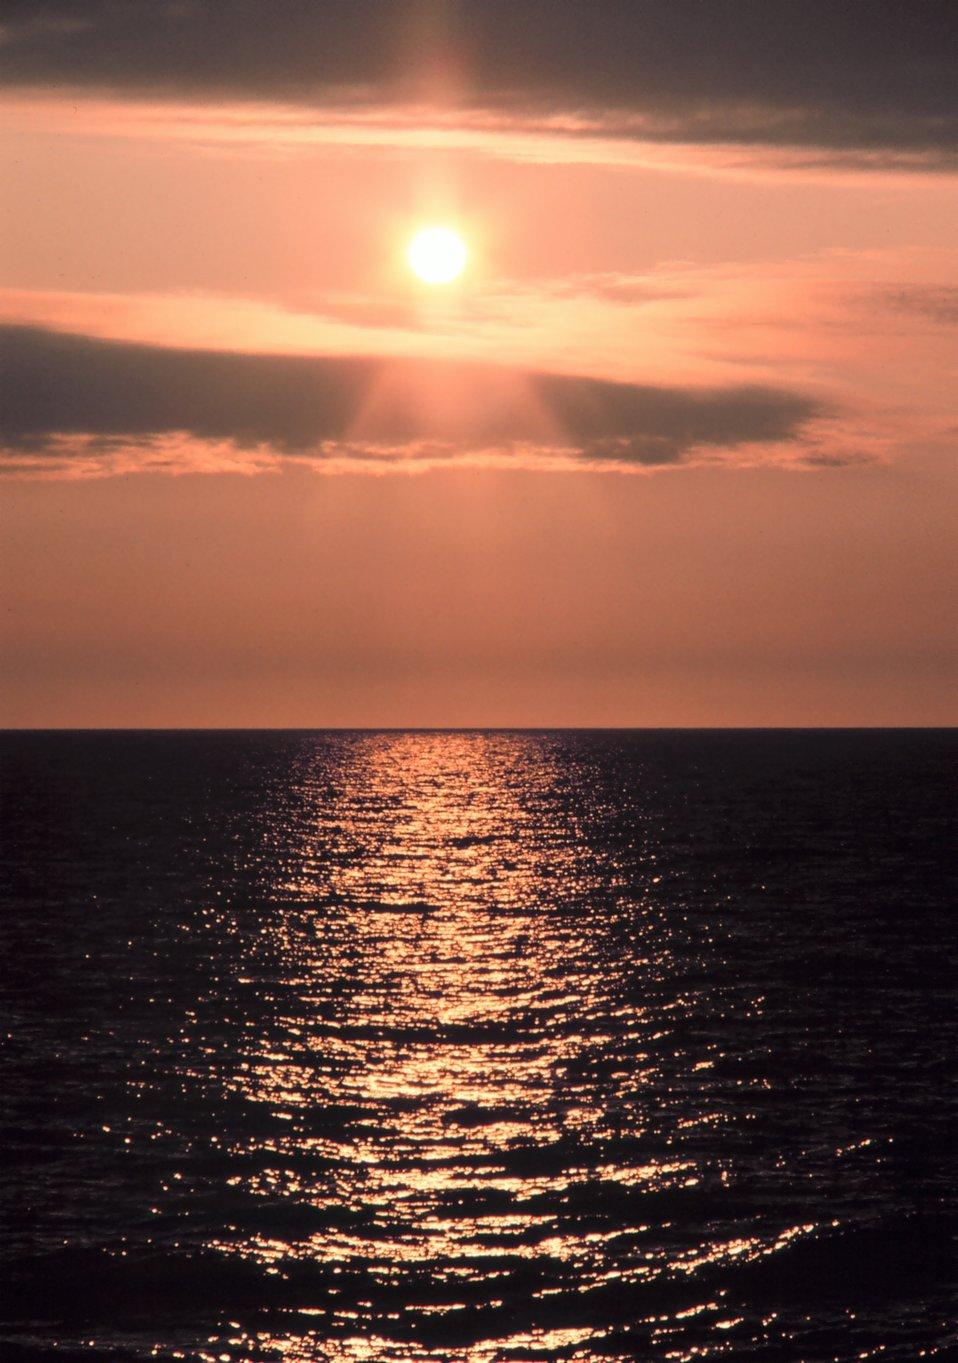 A streak of orange sunlight reflecting off the ocean at sunrise.